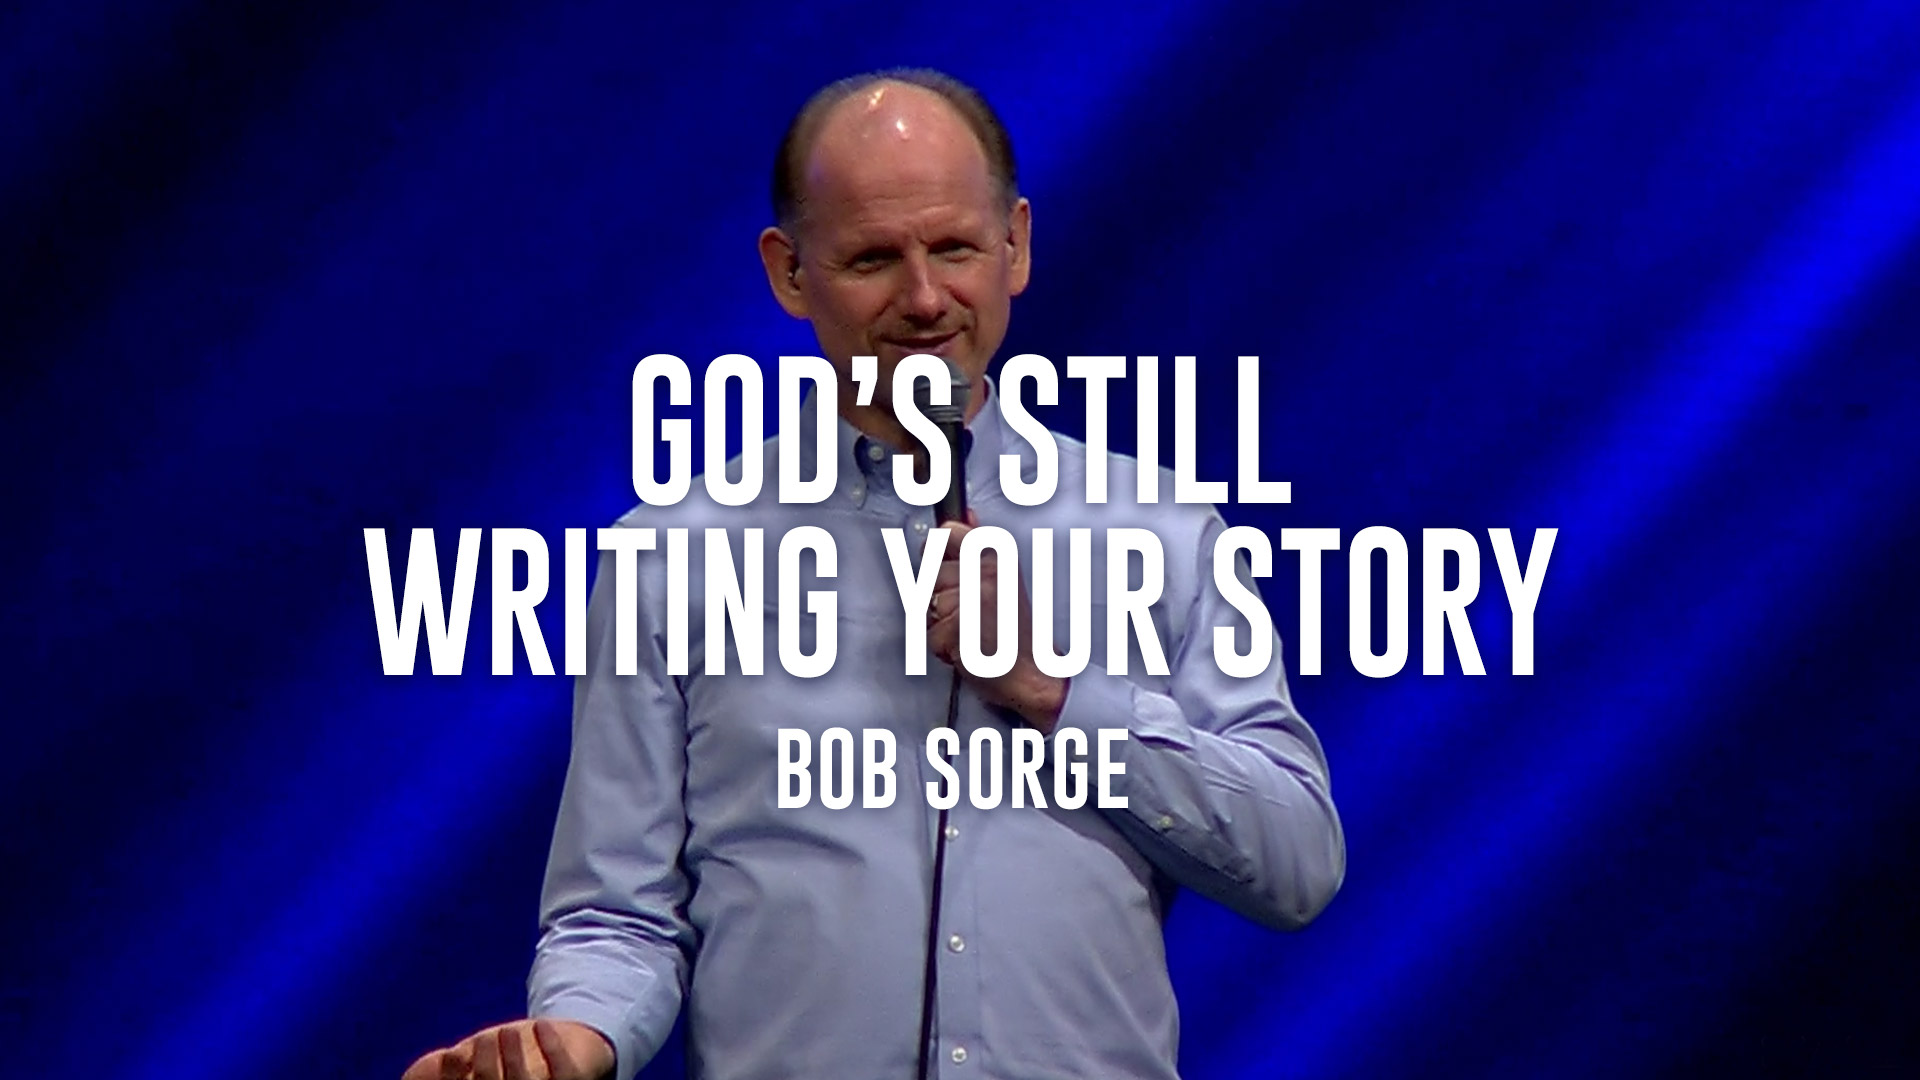 God's Still Writing Your Story - Bob Sorge